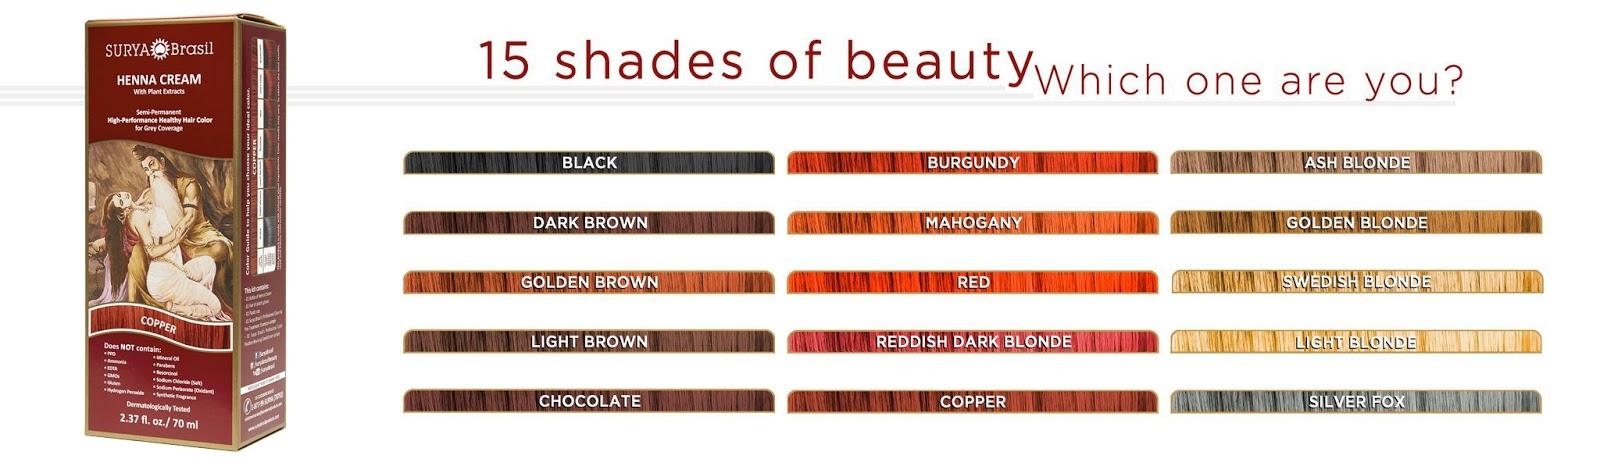 Girly Girl Giveaways Surya Brasil Henna Cream Healthy Hair Color